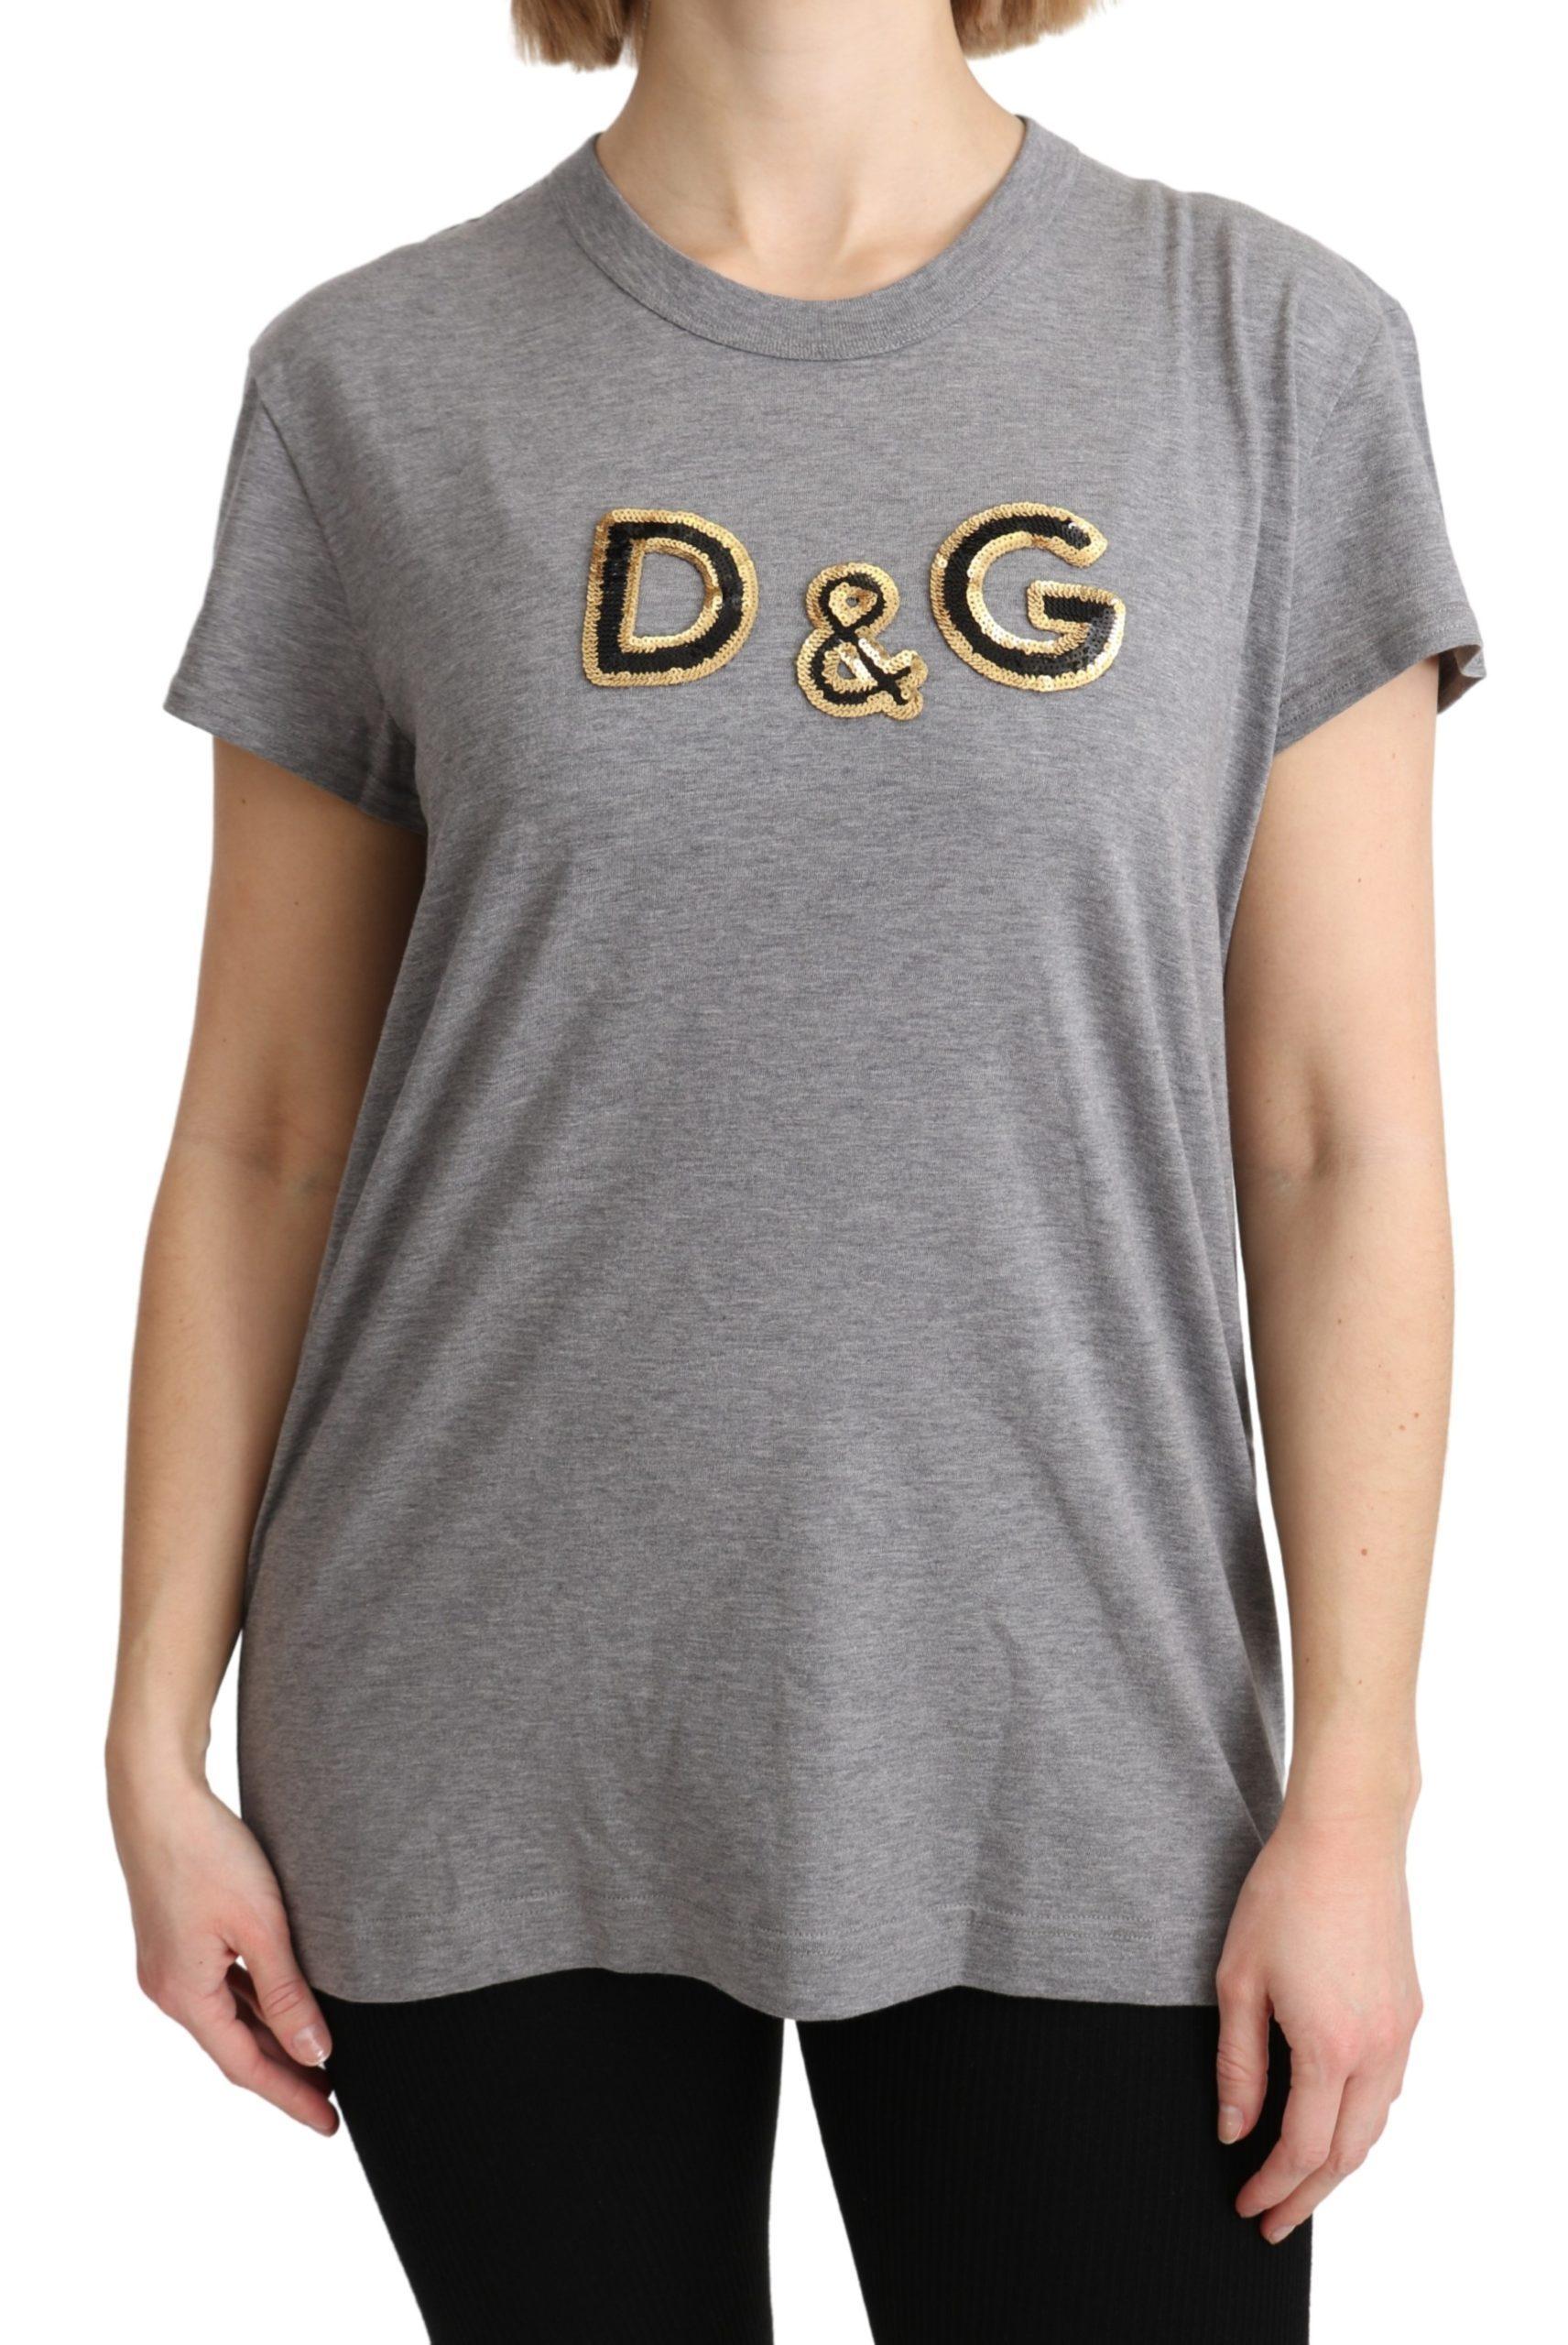 Dolce & Gabbana Women's D&G SS T-Shirt Gray TSH5183 - IT44|L